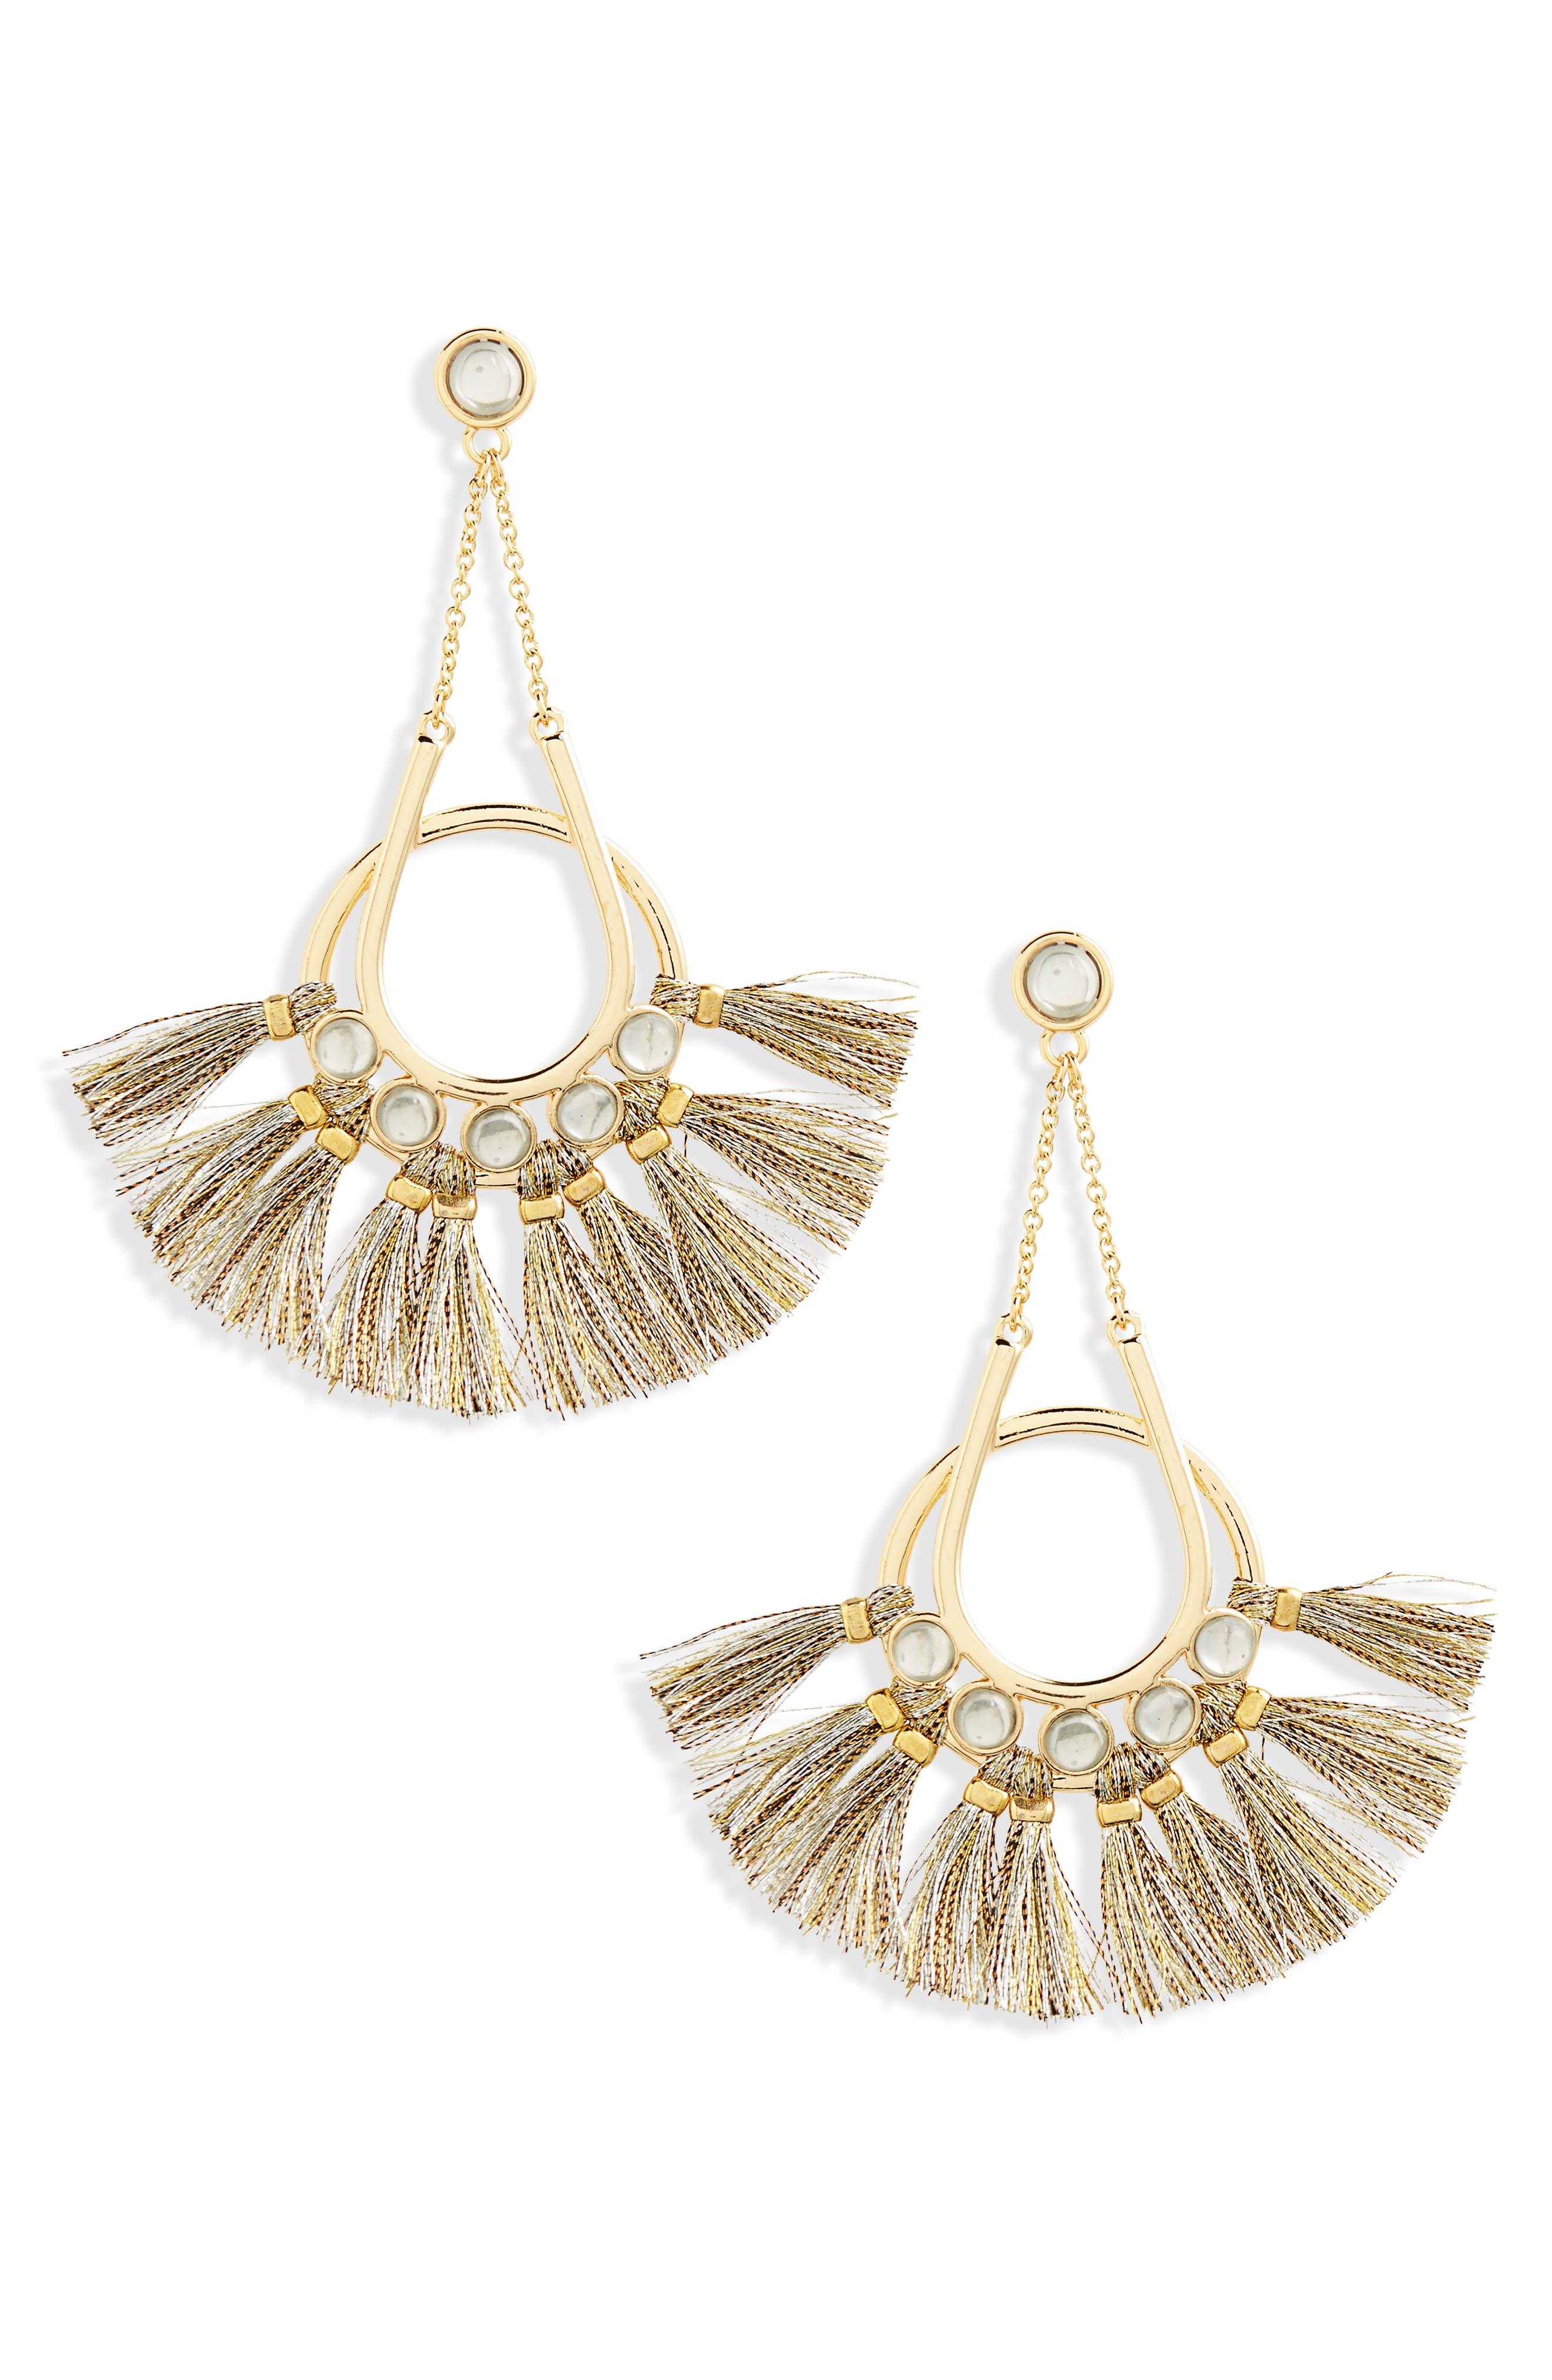 Utopia Tassel Chandelier Earrings,                             Main thumbnail 1, color,                             Gold